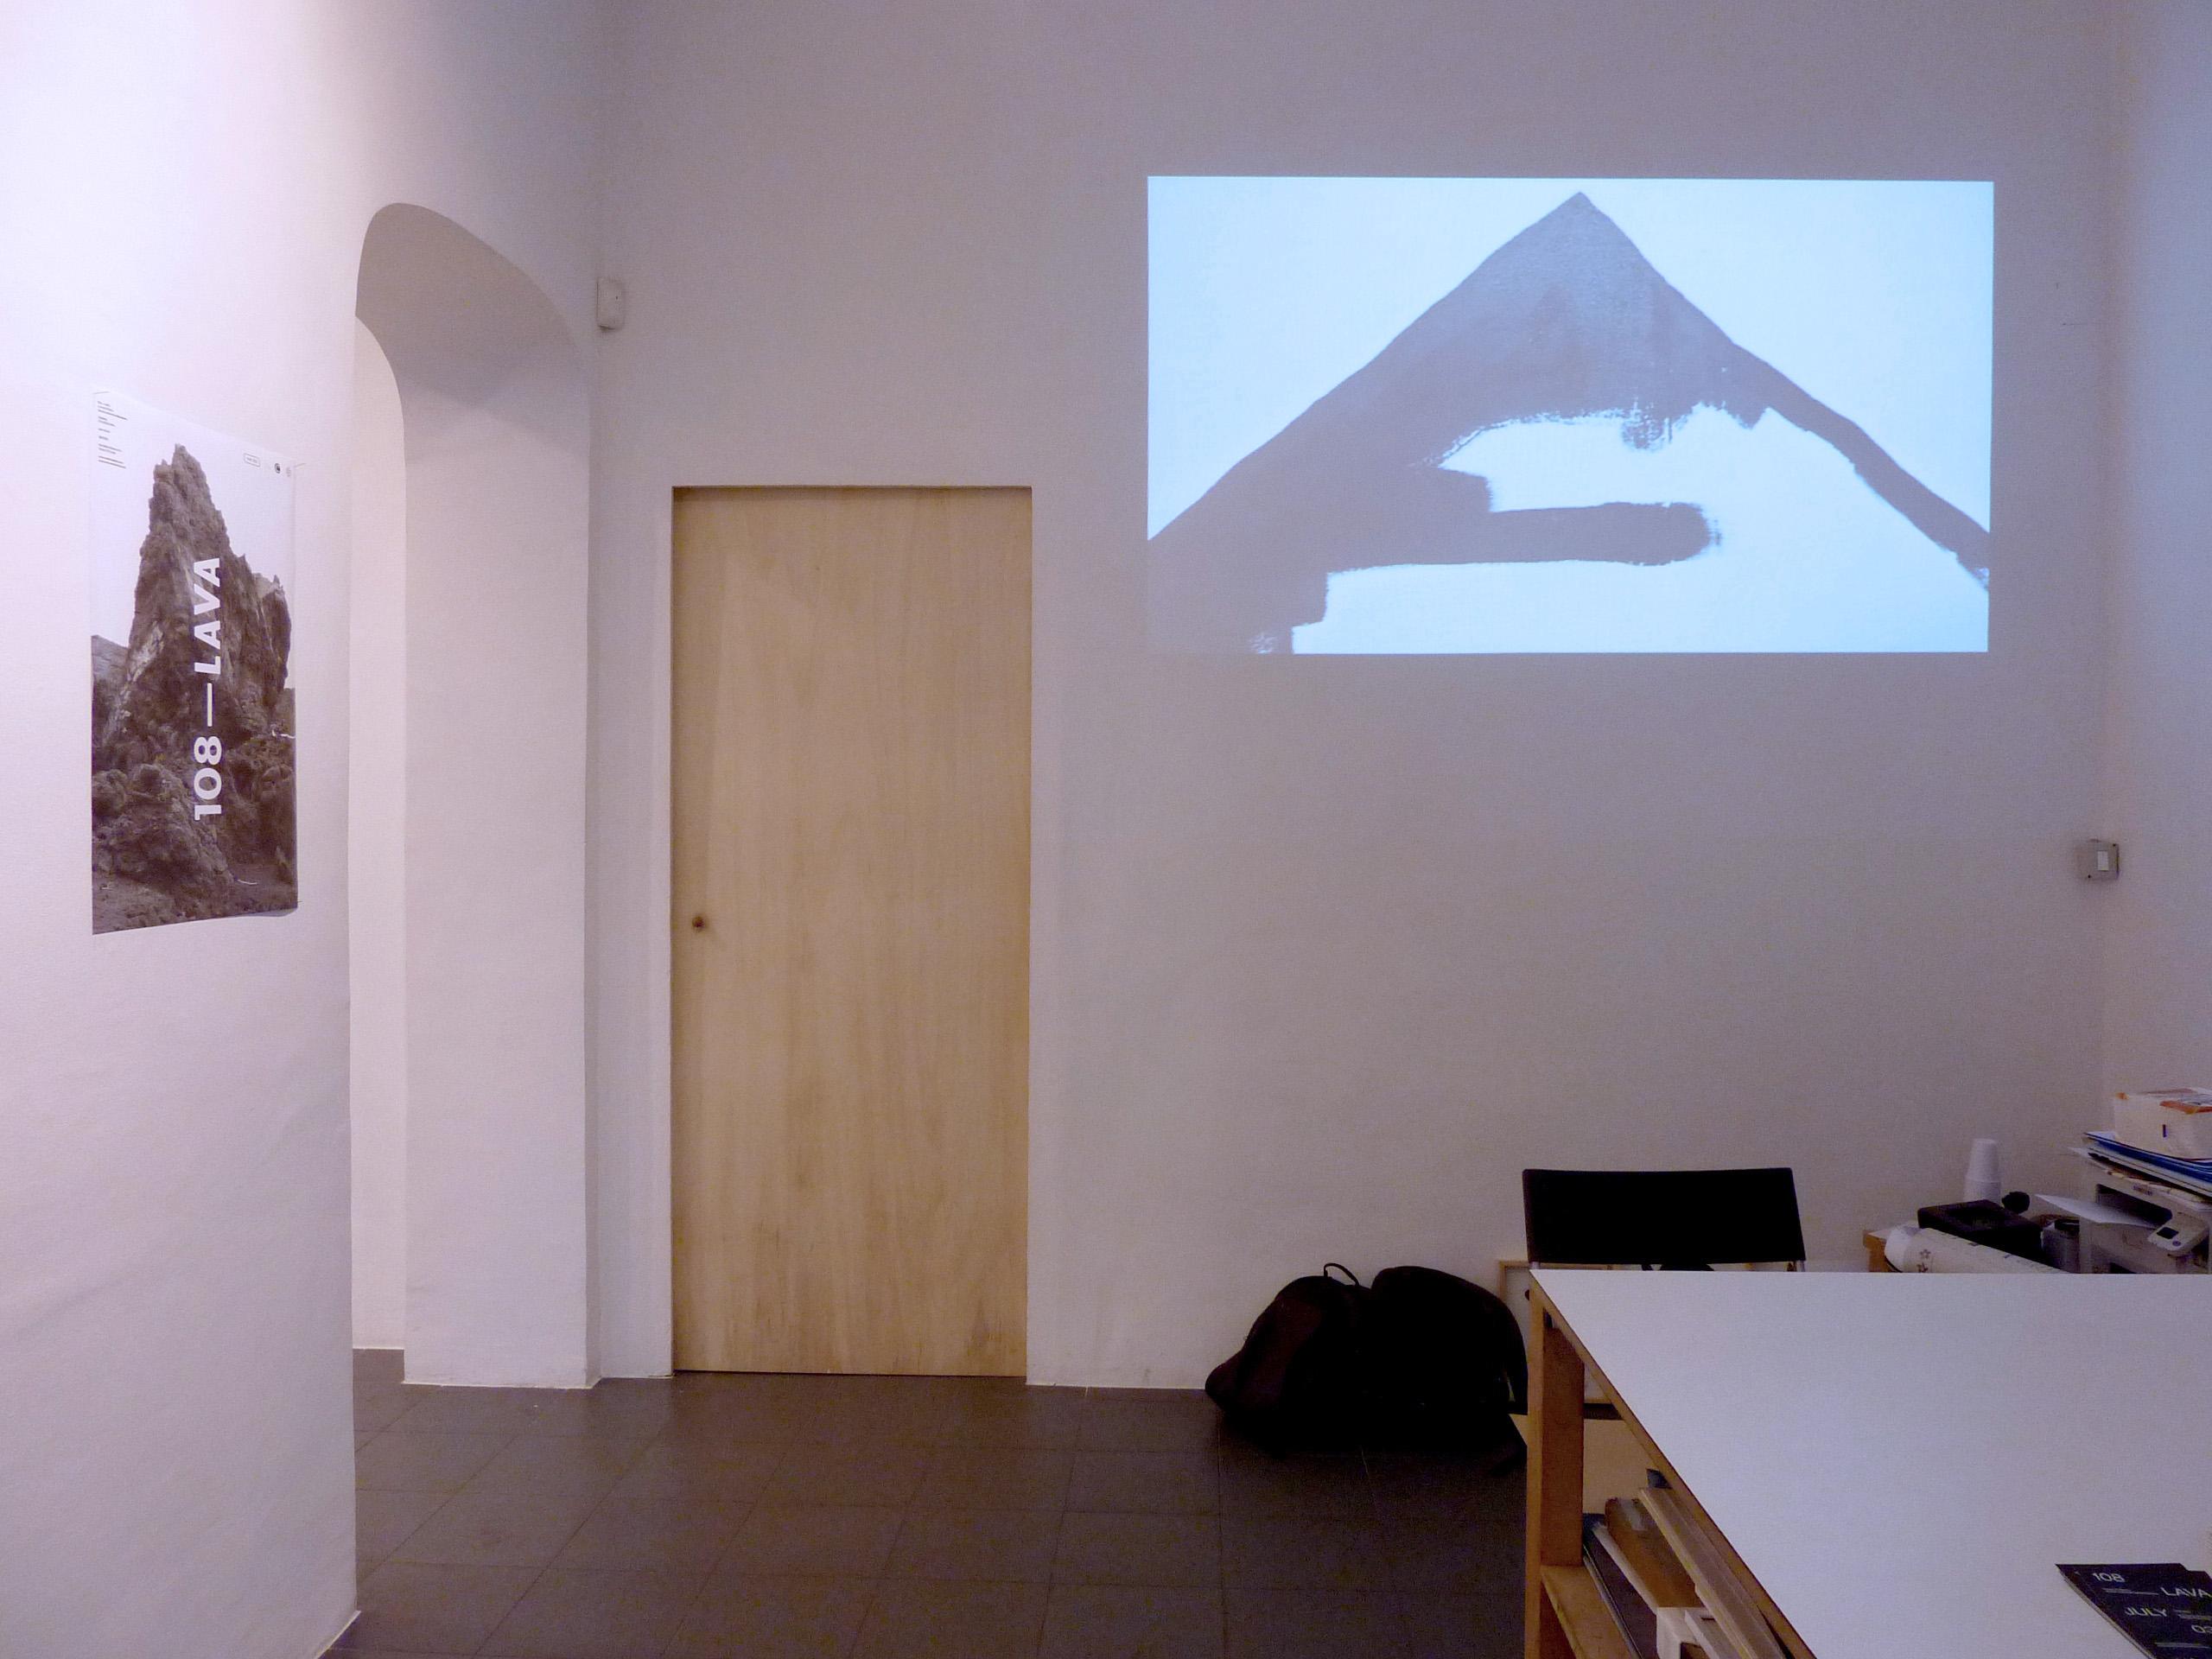 108-lava-at-van-der-gallery-recap-06